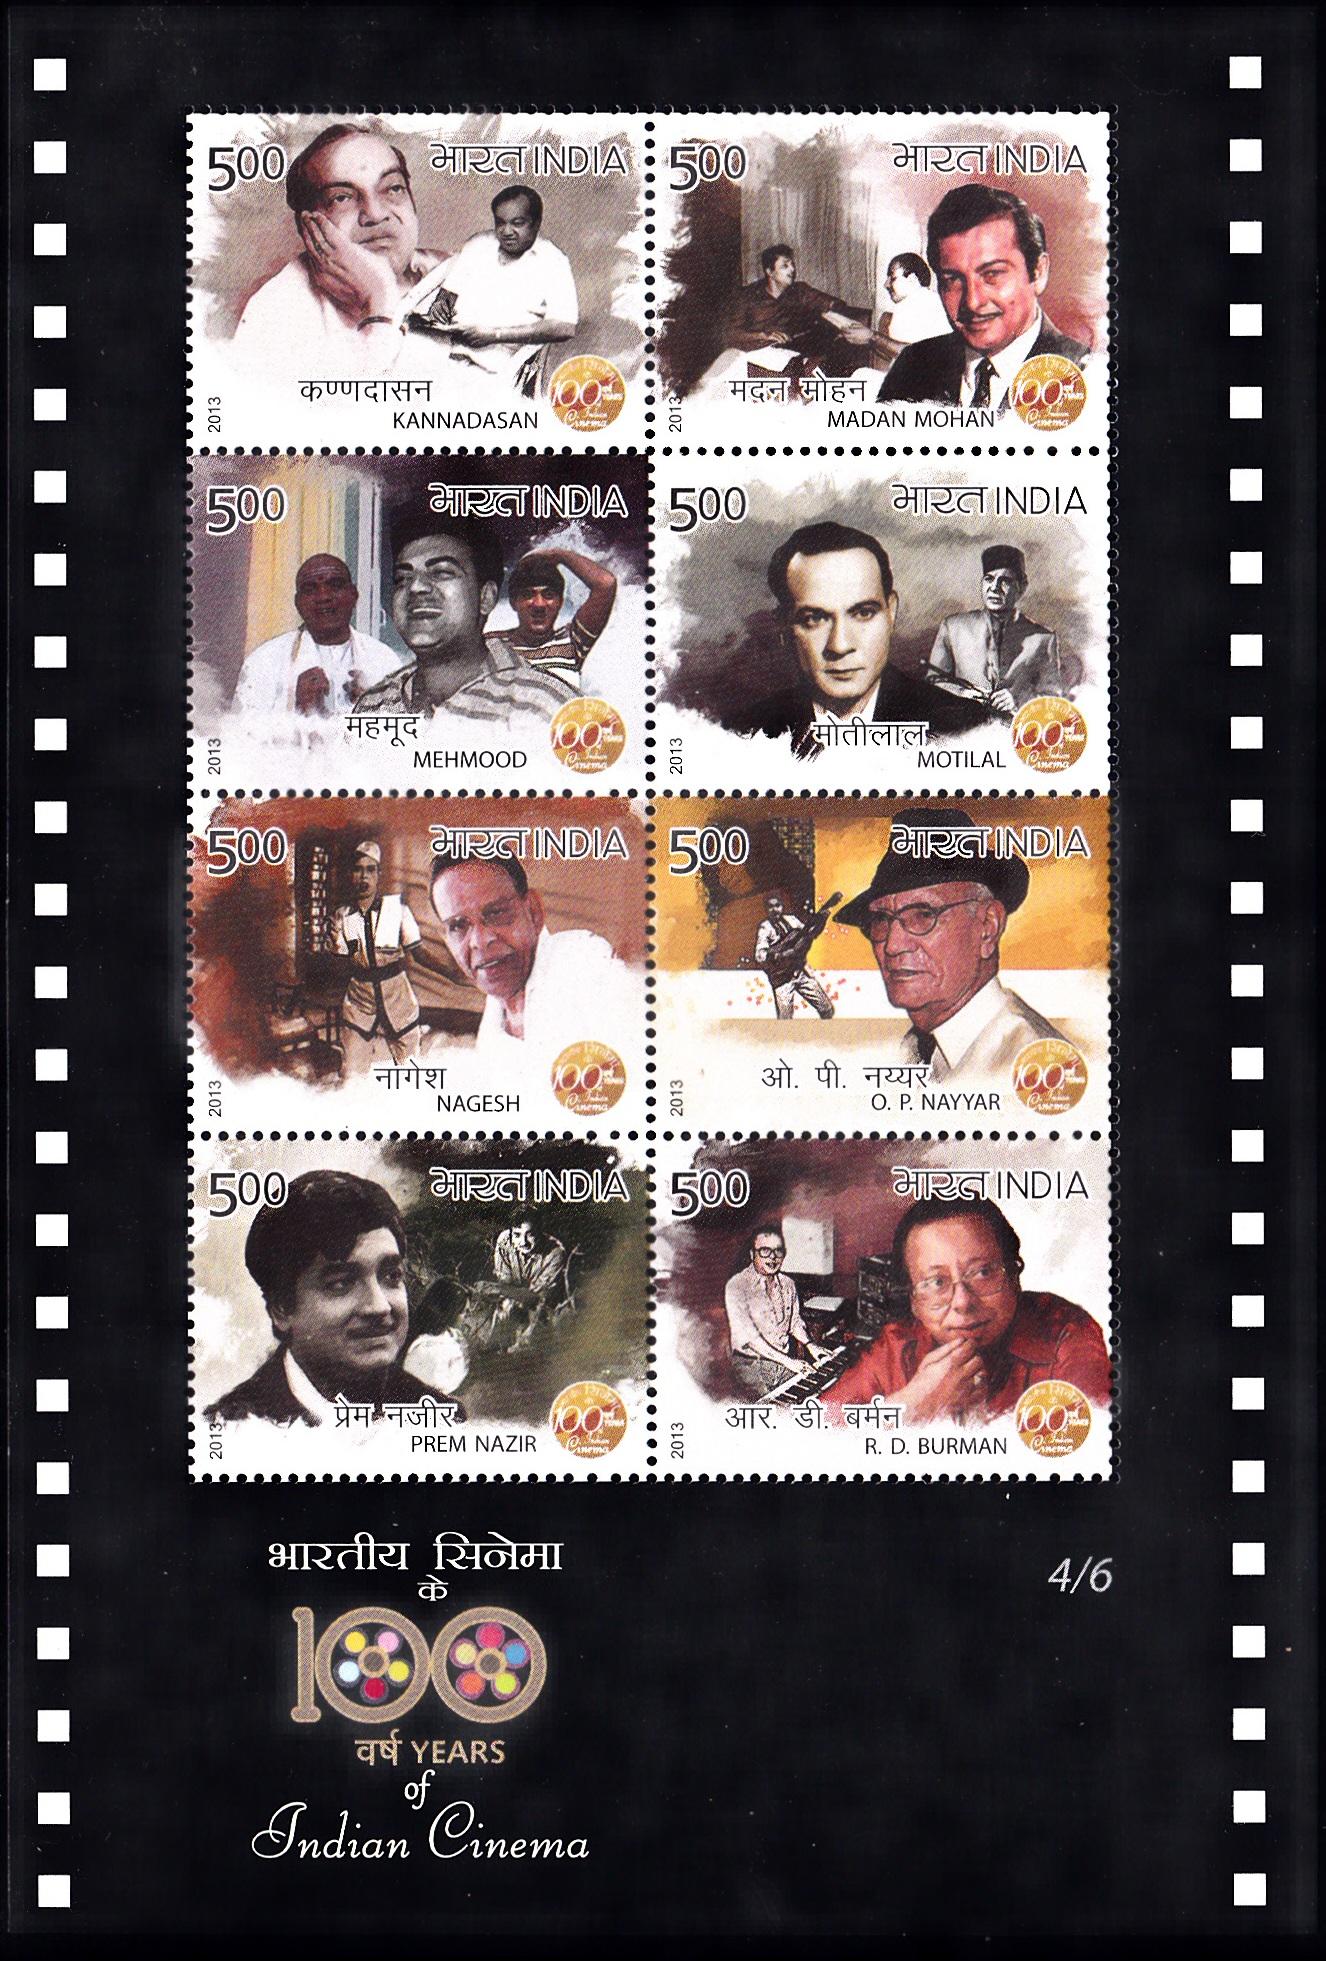 Indian Cinema Centenary : Miniature Sheet 4